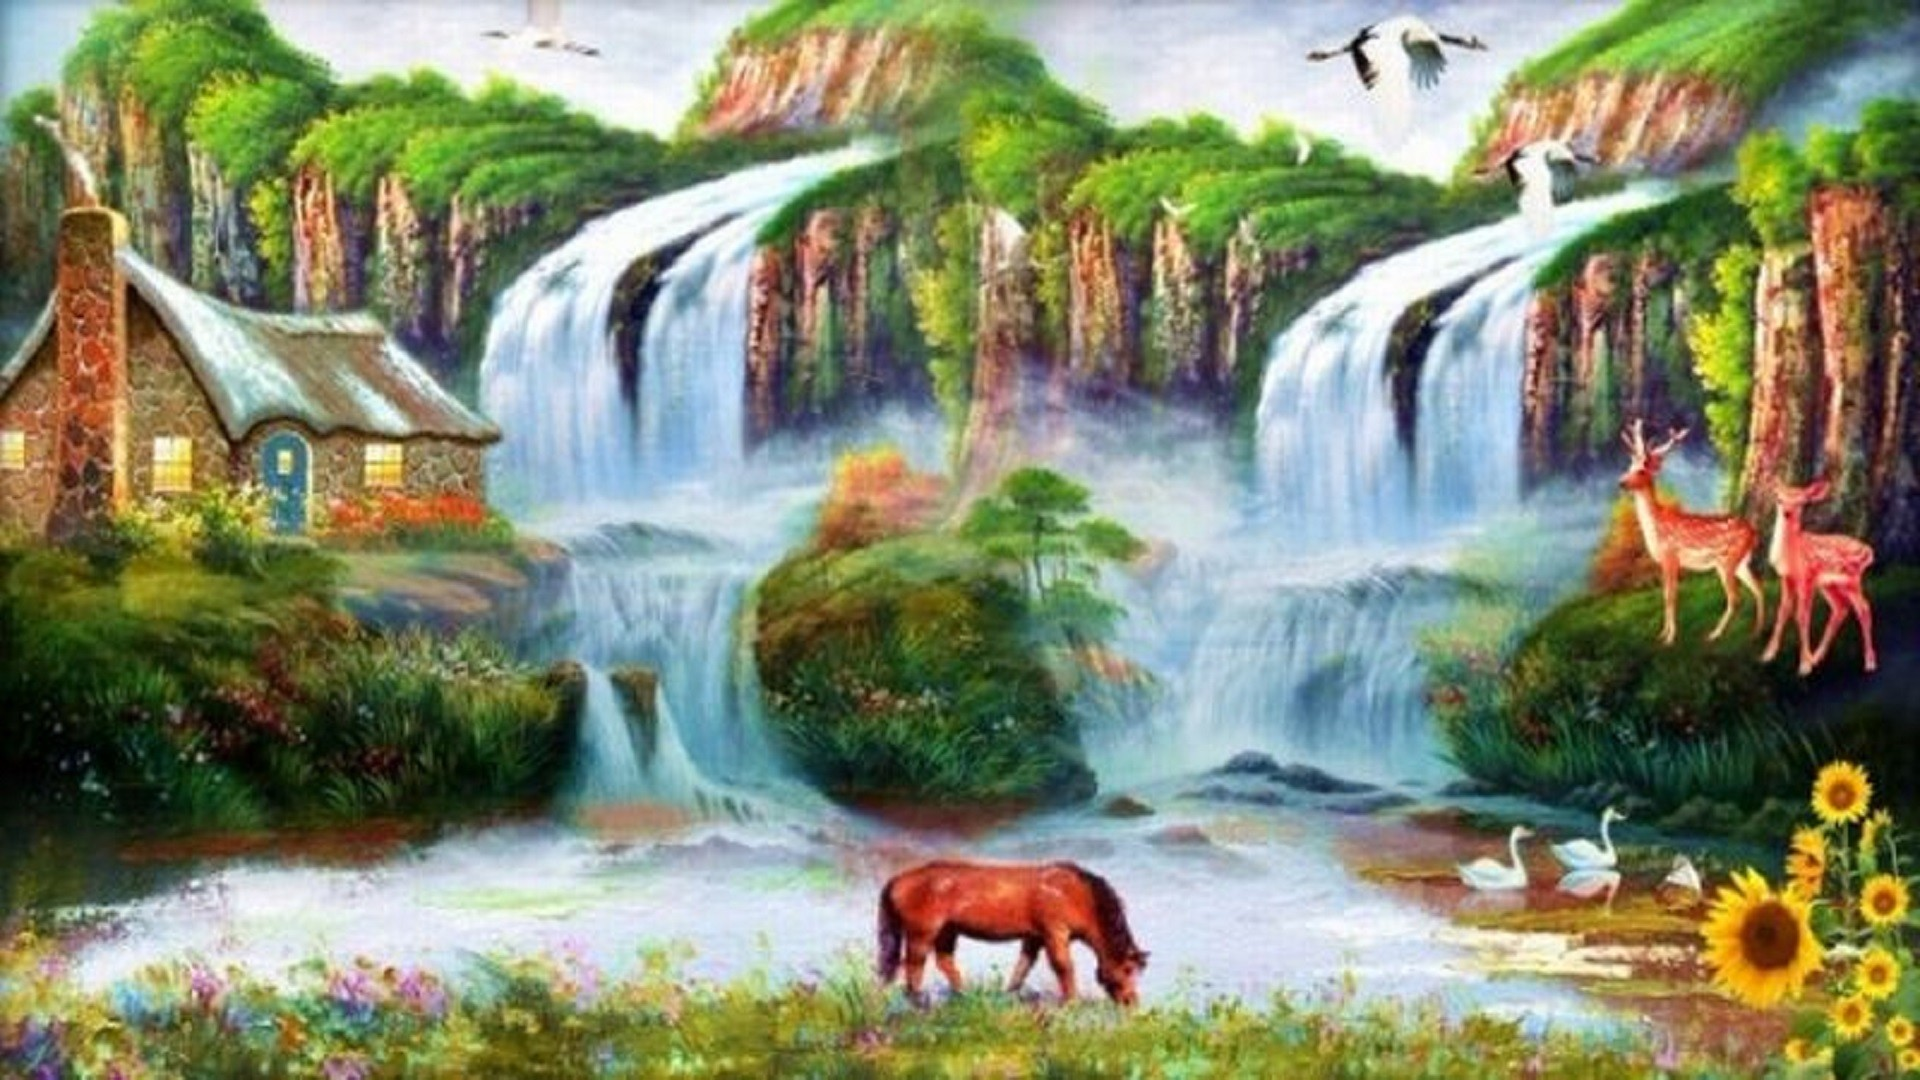 3d Free Fall Nature Wallpaper Wallpapers For Desktop Water Scenes 61 Images